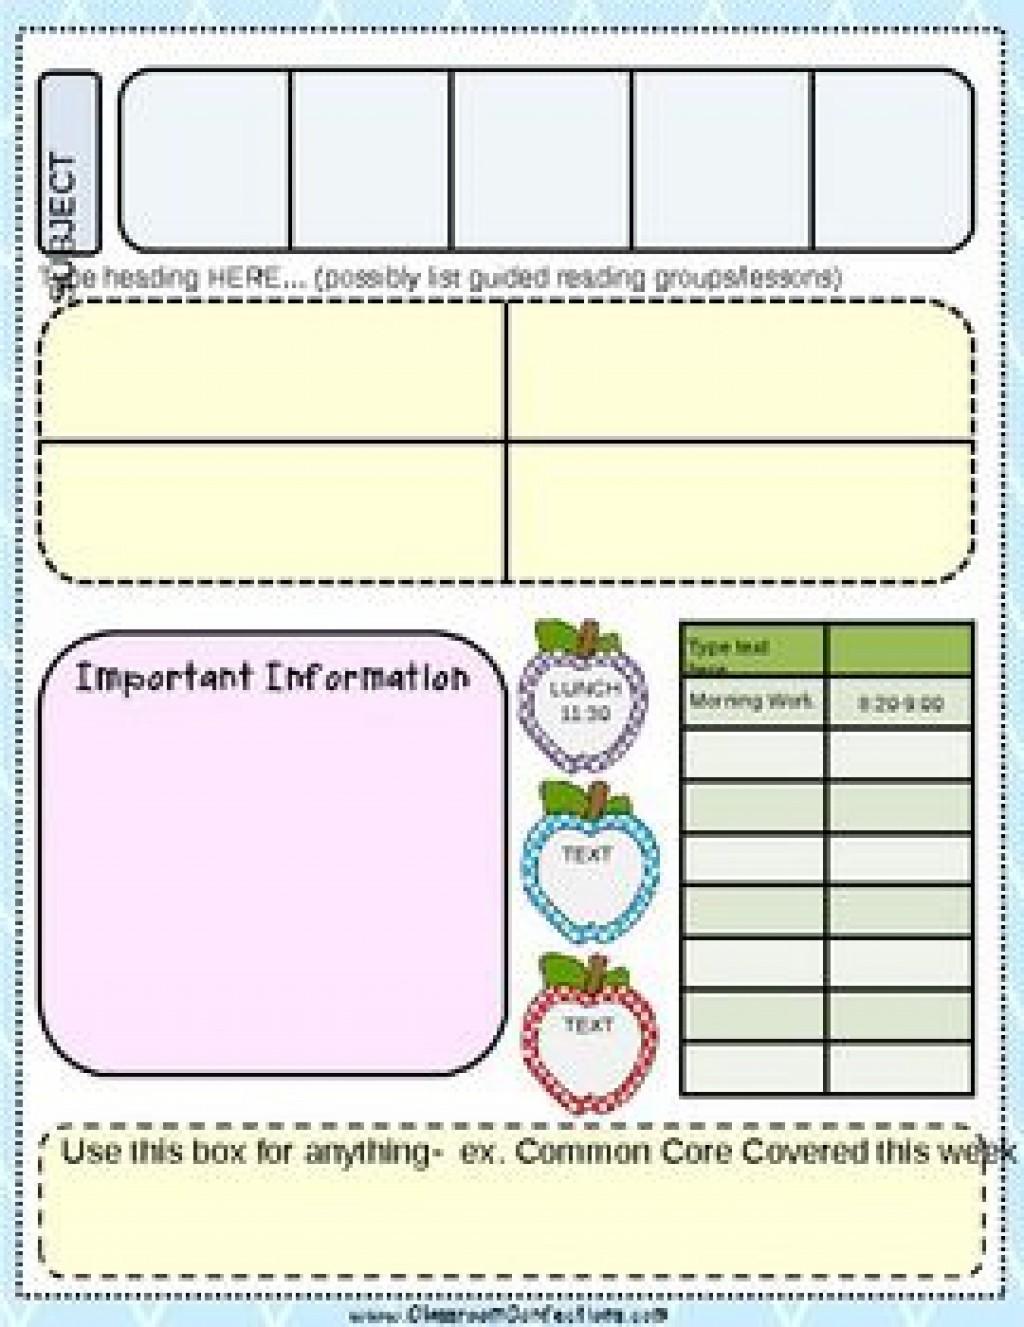 005 Unforgettable Editable Lesson Plan Template Kindergarten Highest Clarity  FreeLarge